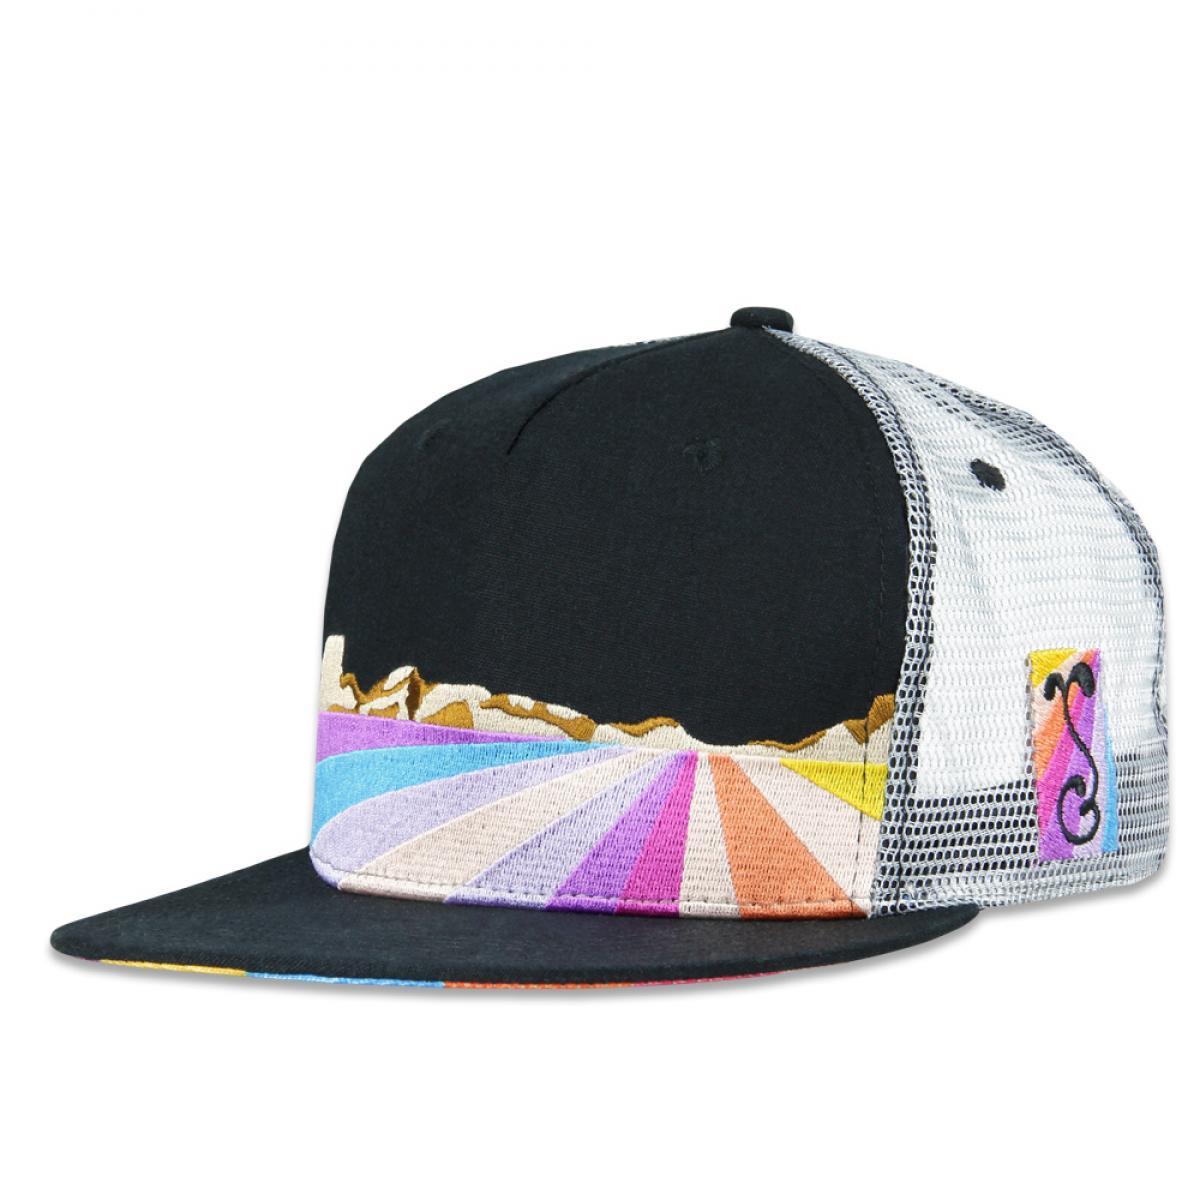 Jerry Garcia Playa Vista Mesh Grassroots Hat